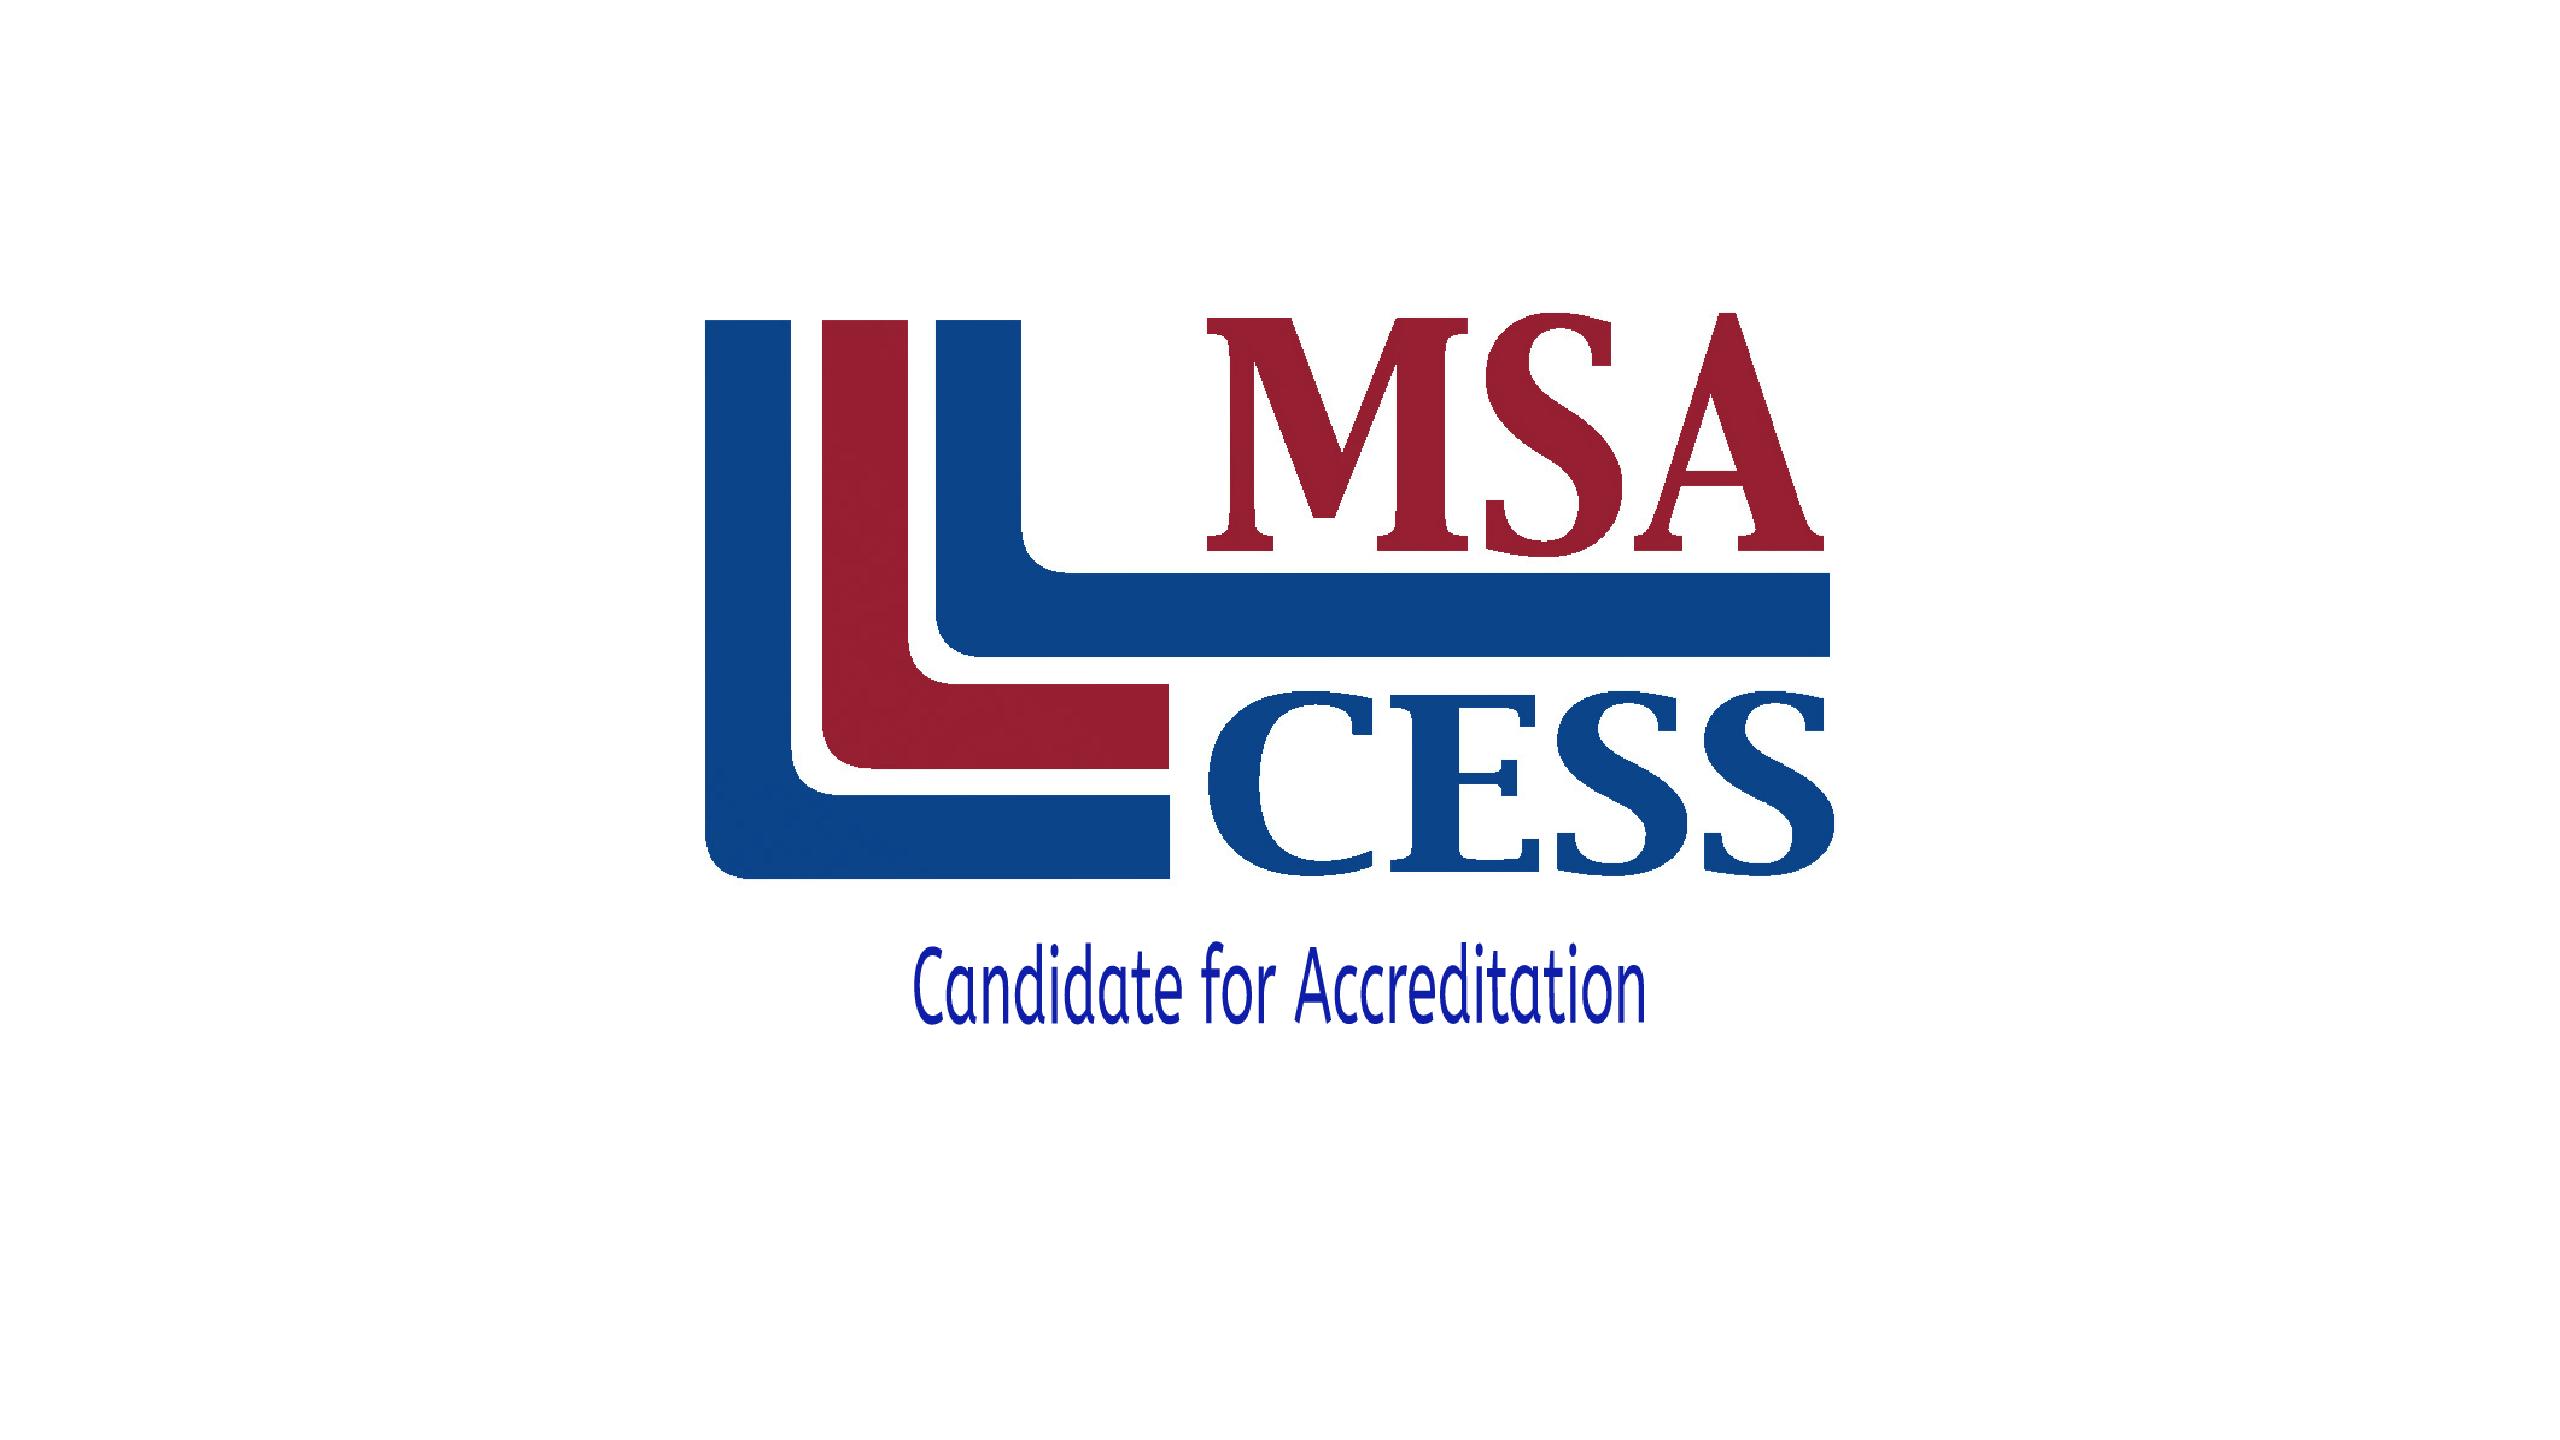 TEECS is pursuing MSA-CESS accreditation!